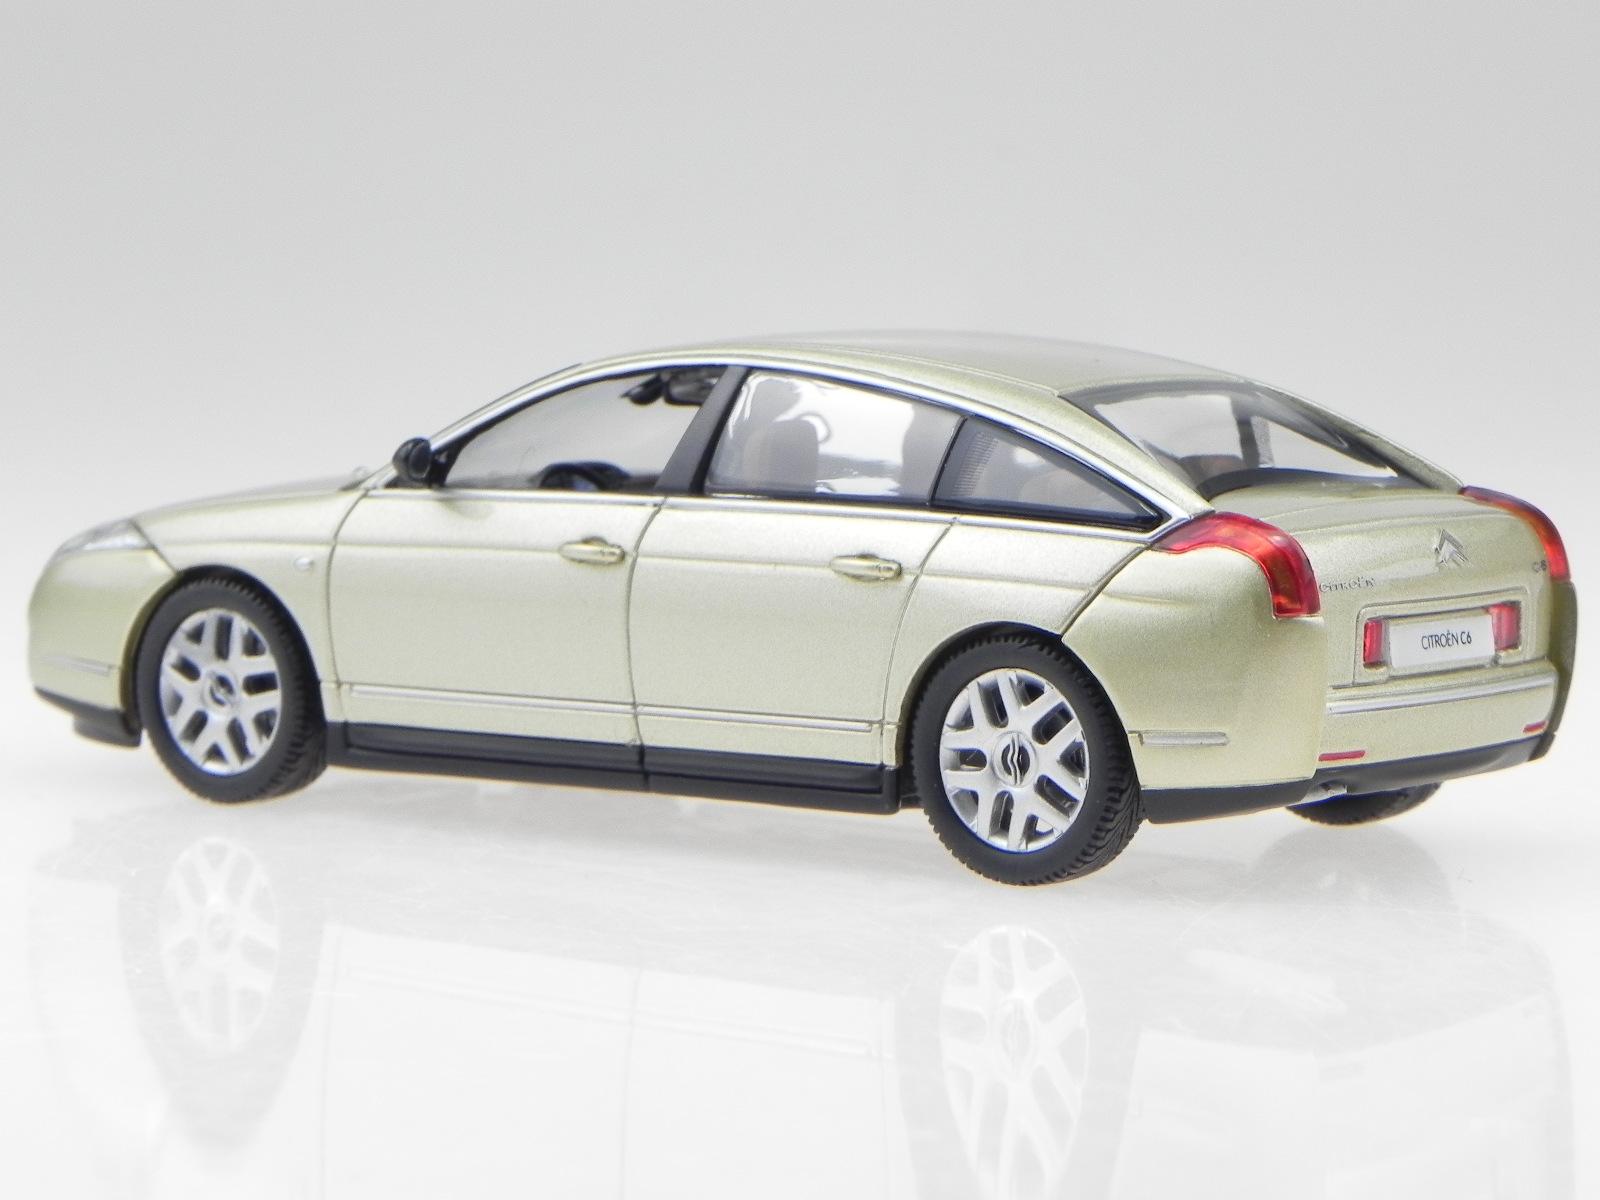 citroen c6 c 6 beige 2012 modellauto 155619 norev 1 43. Black Bedroom Furniture Sets. Home Design Ideas